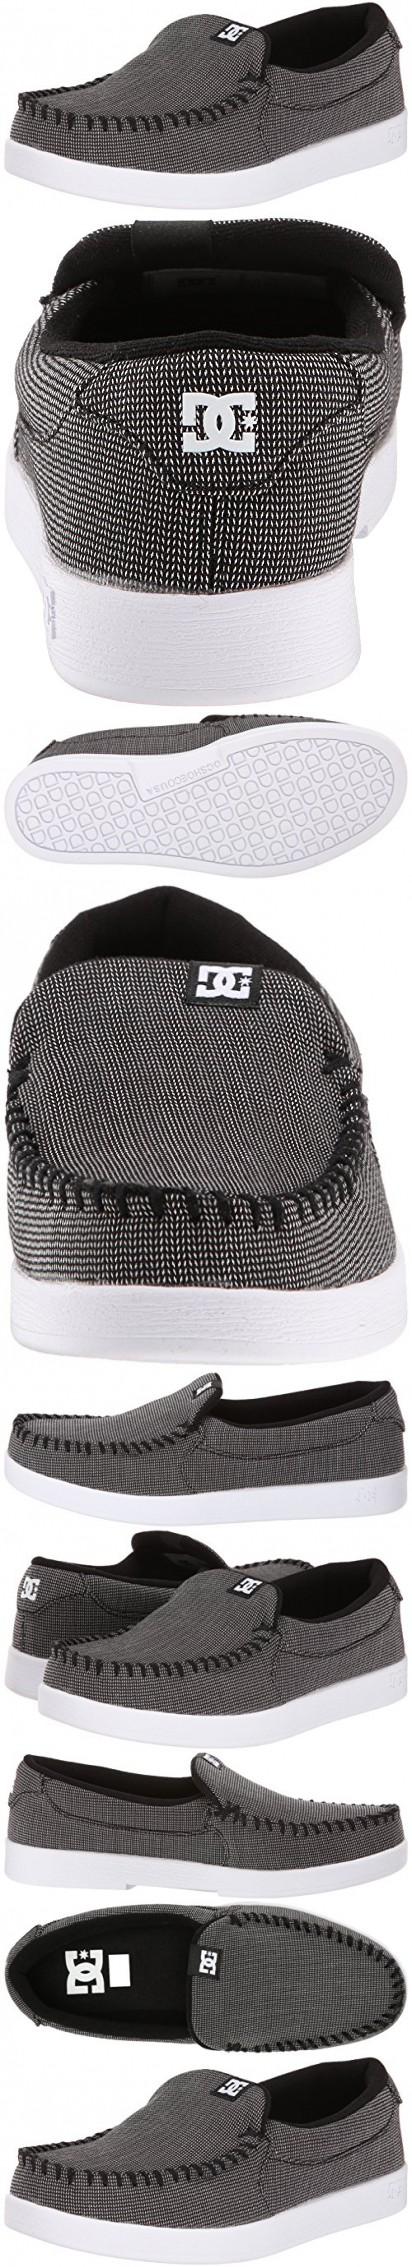 DC Men's Villain TX Skate Shoe, Black/Black/White, 7 M US